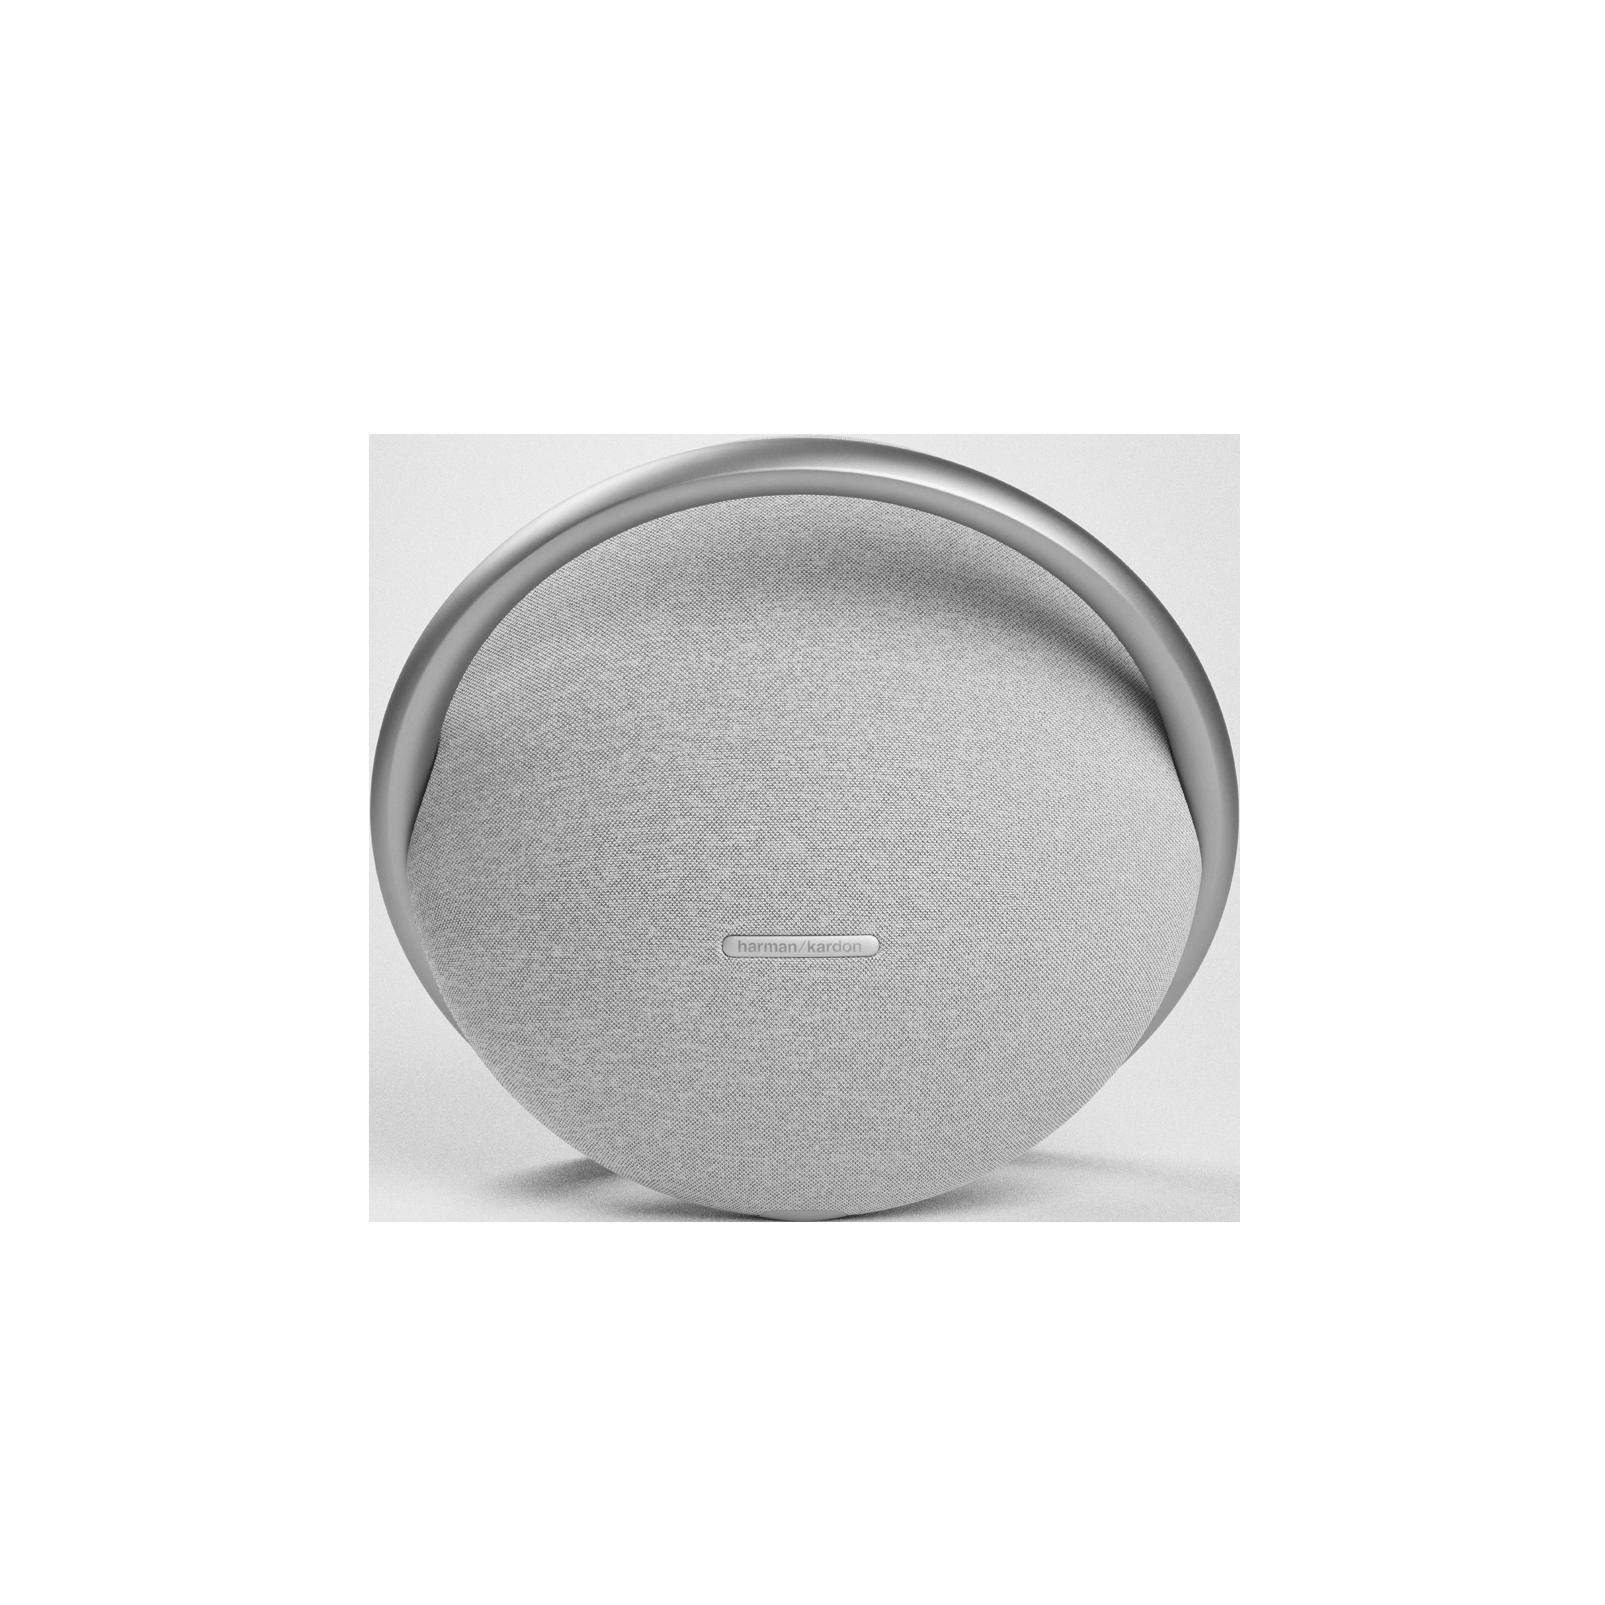 Onyx Studio 7 - Grey - Portable Stereo Bluetooth Speaker - Front